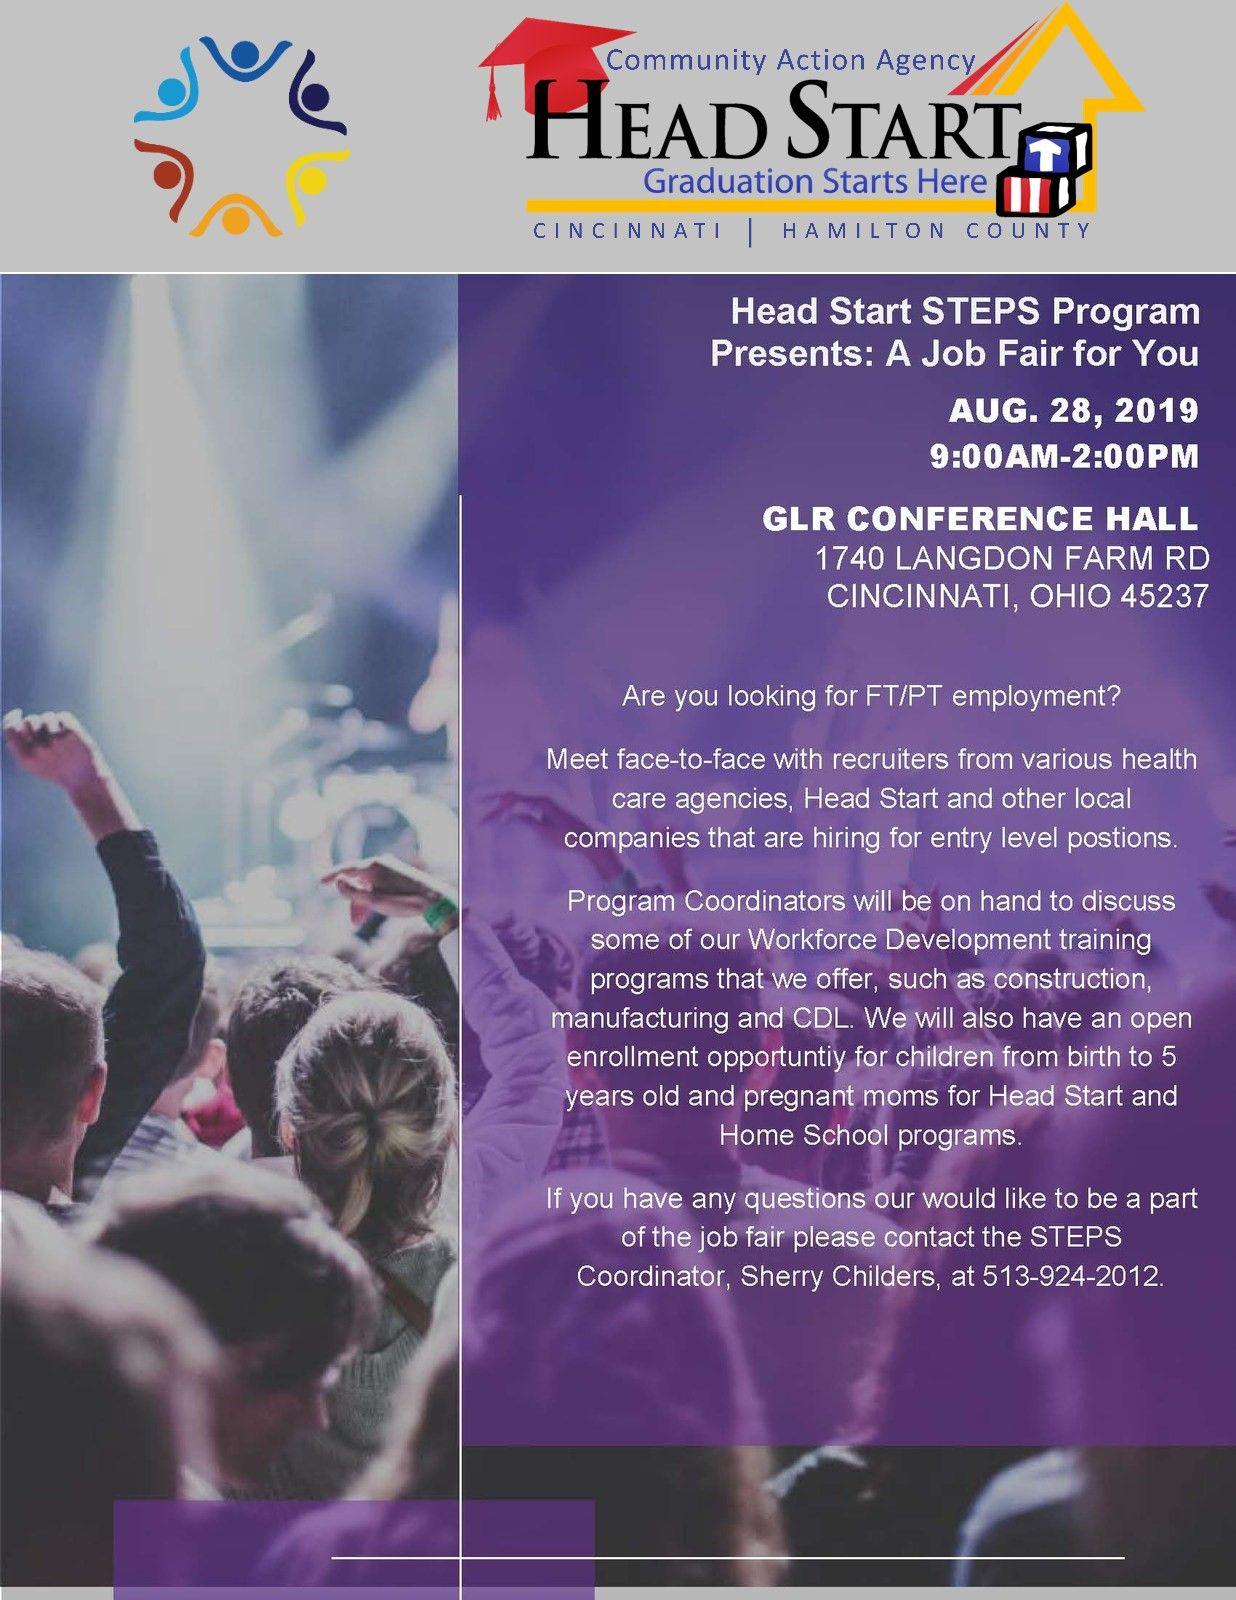 CAA Head Start S.T.E.P.S. Program Presents: A Job Fair for You